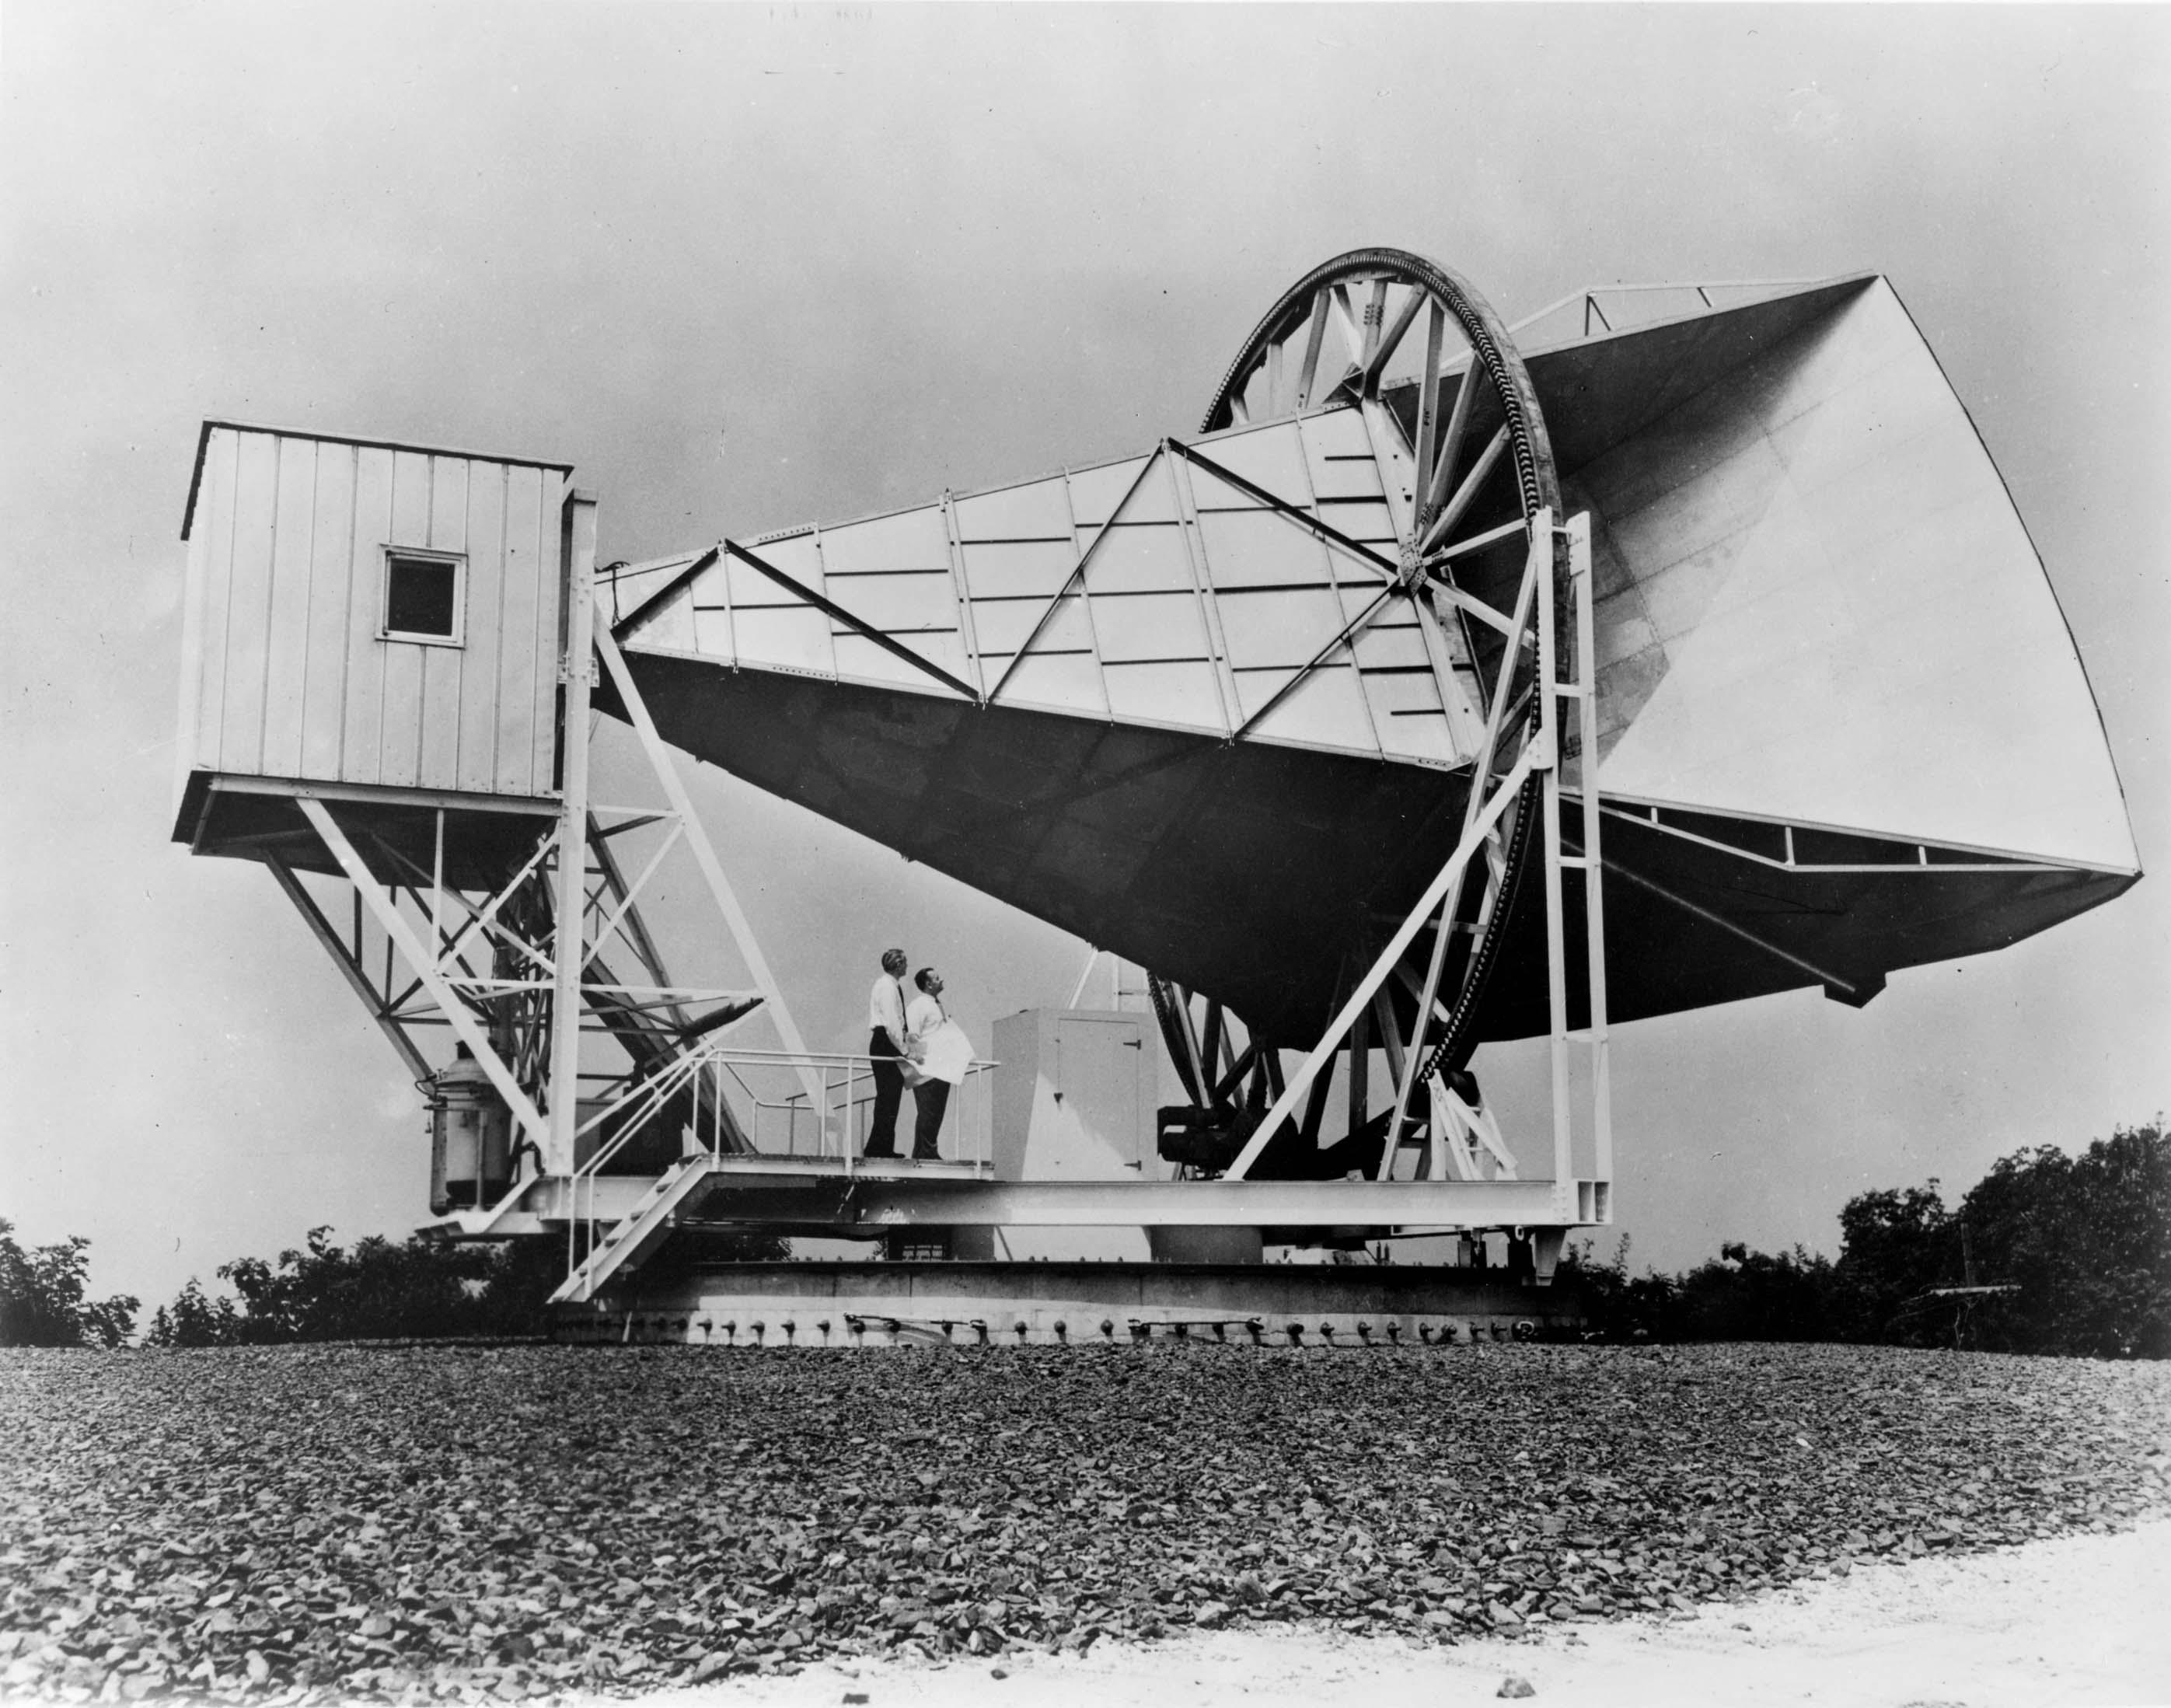 By NASA (Great Images in NASA Description) [Public domain], via Wikimedia Commons